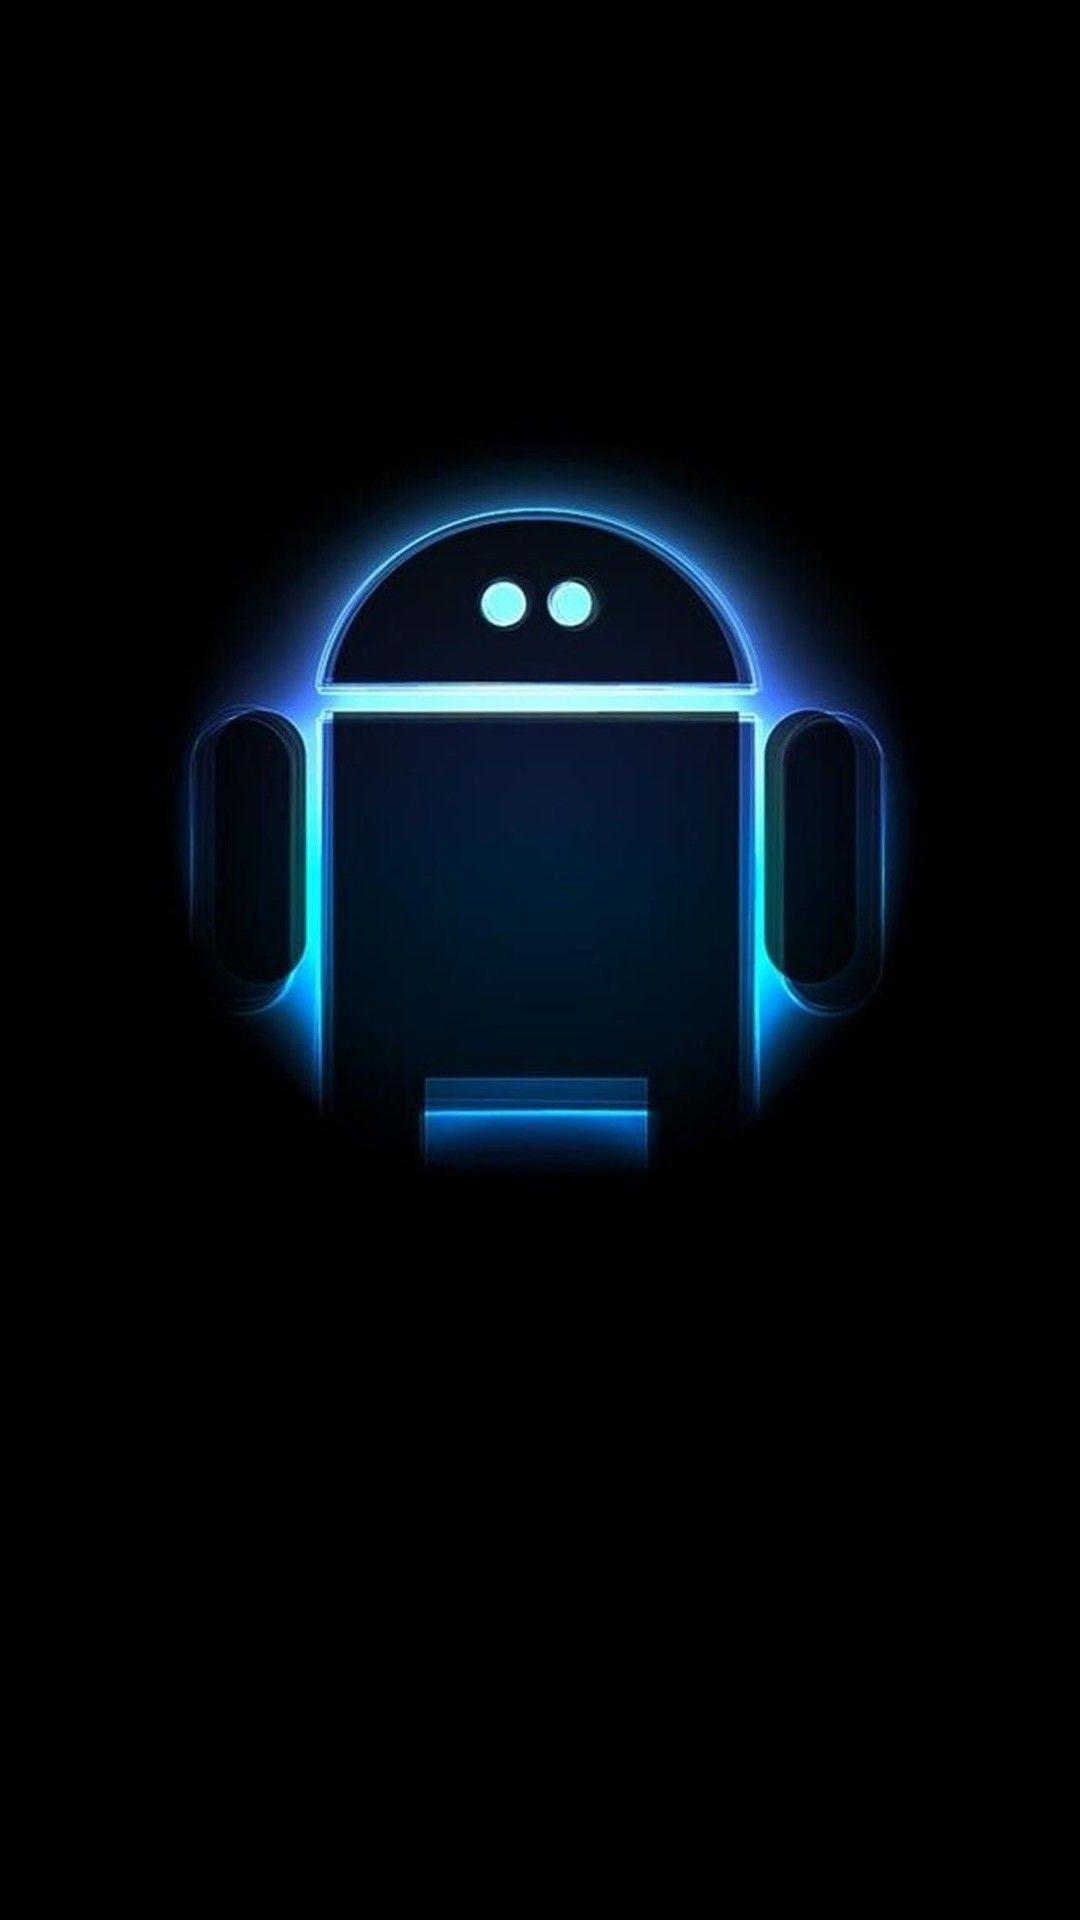 Android Samsung Logo Android Wallpaper Samsung Wallpaper